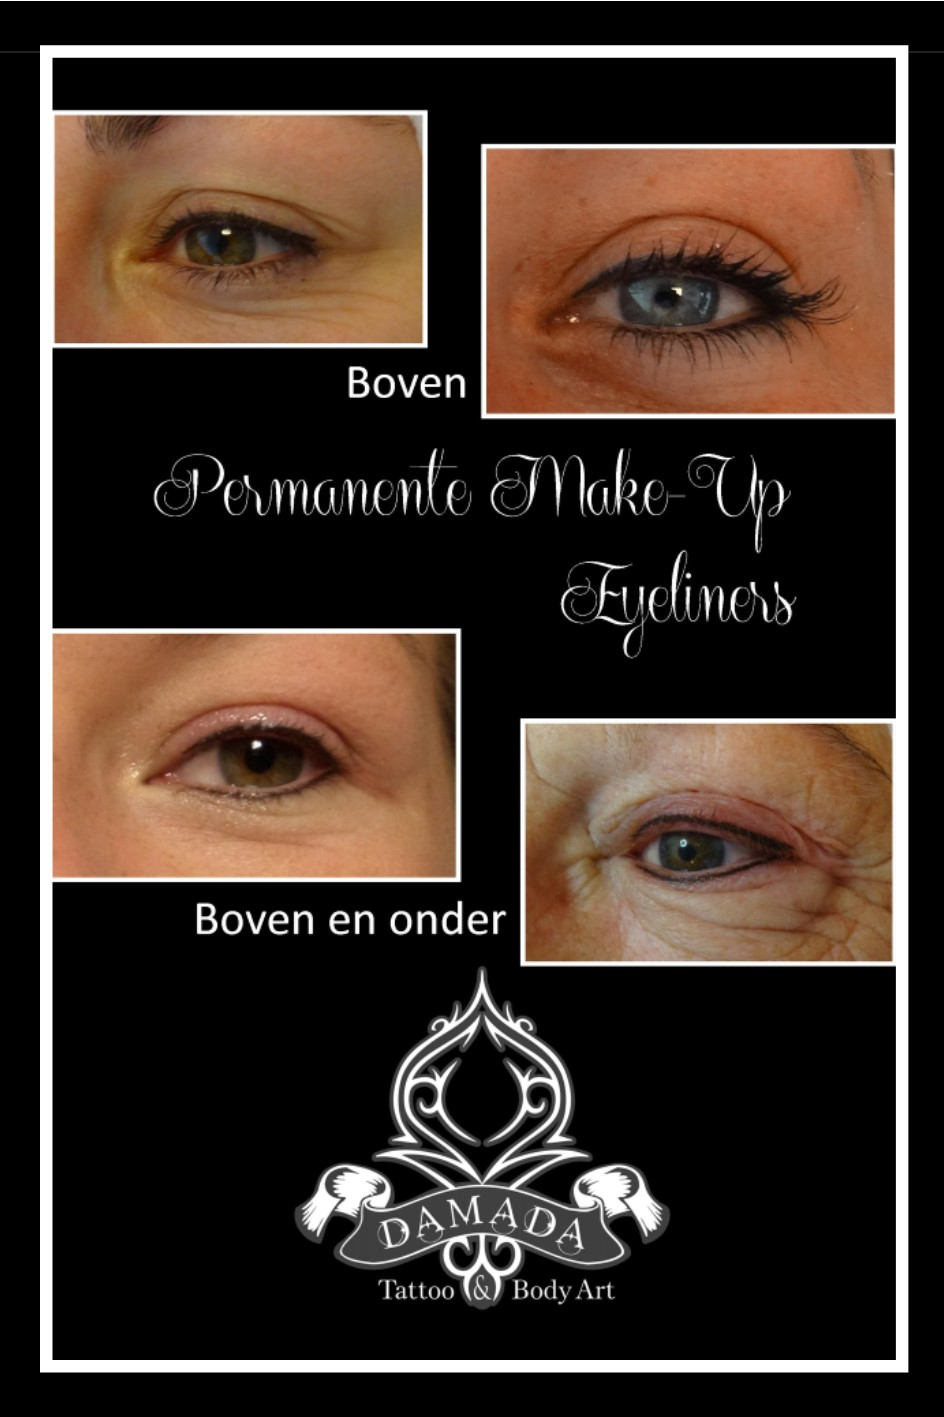 Eyeliners permanente make up